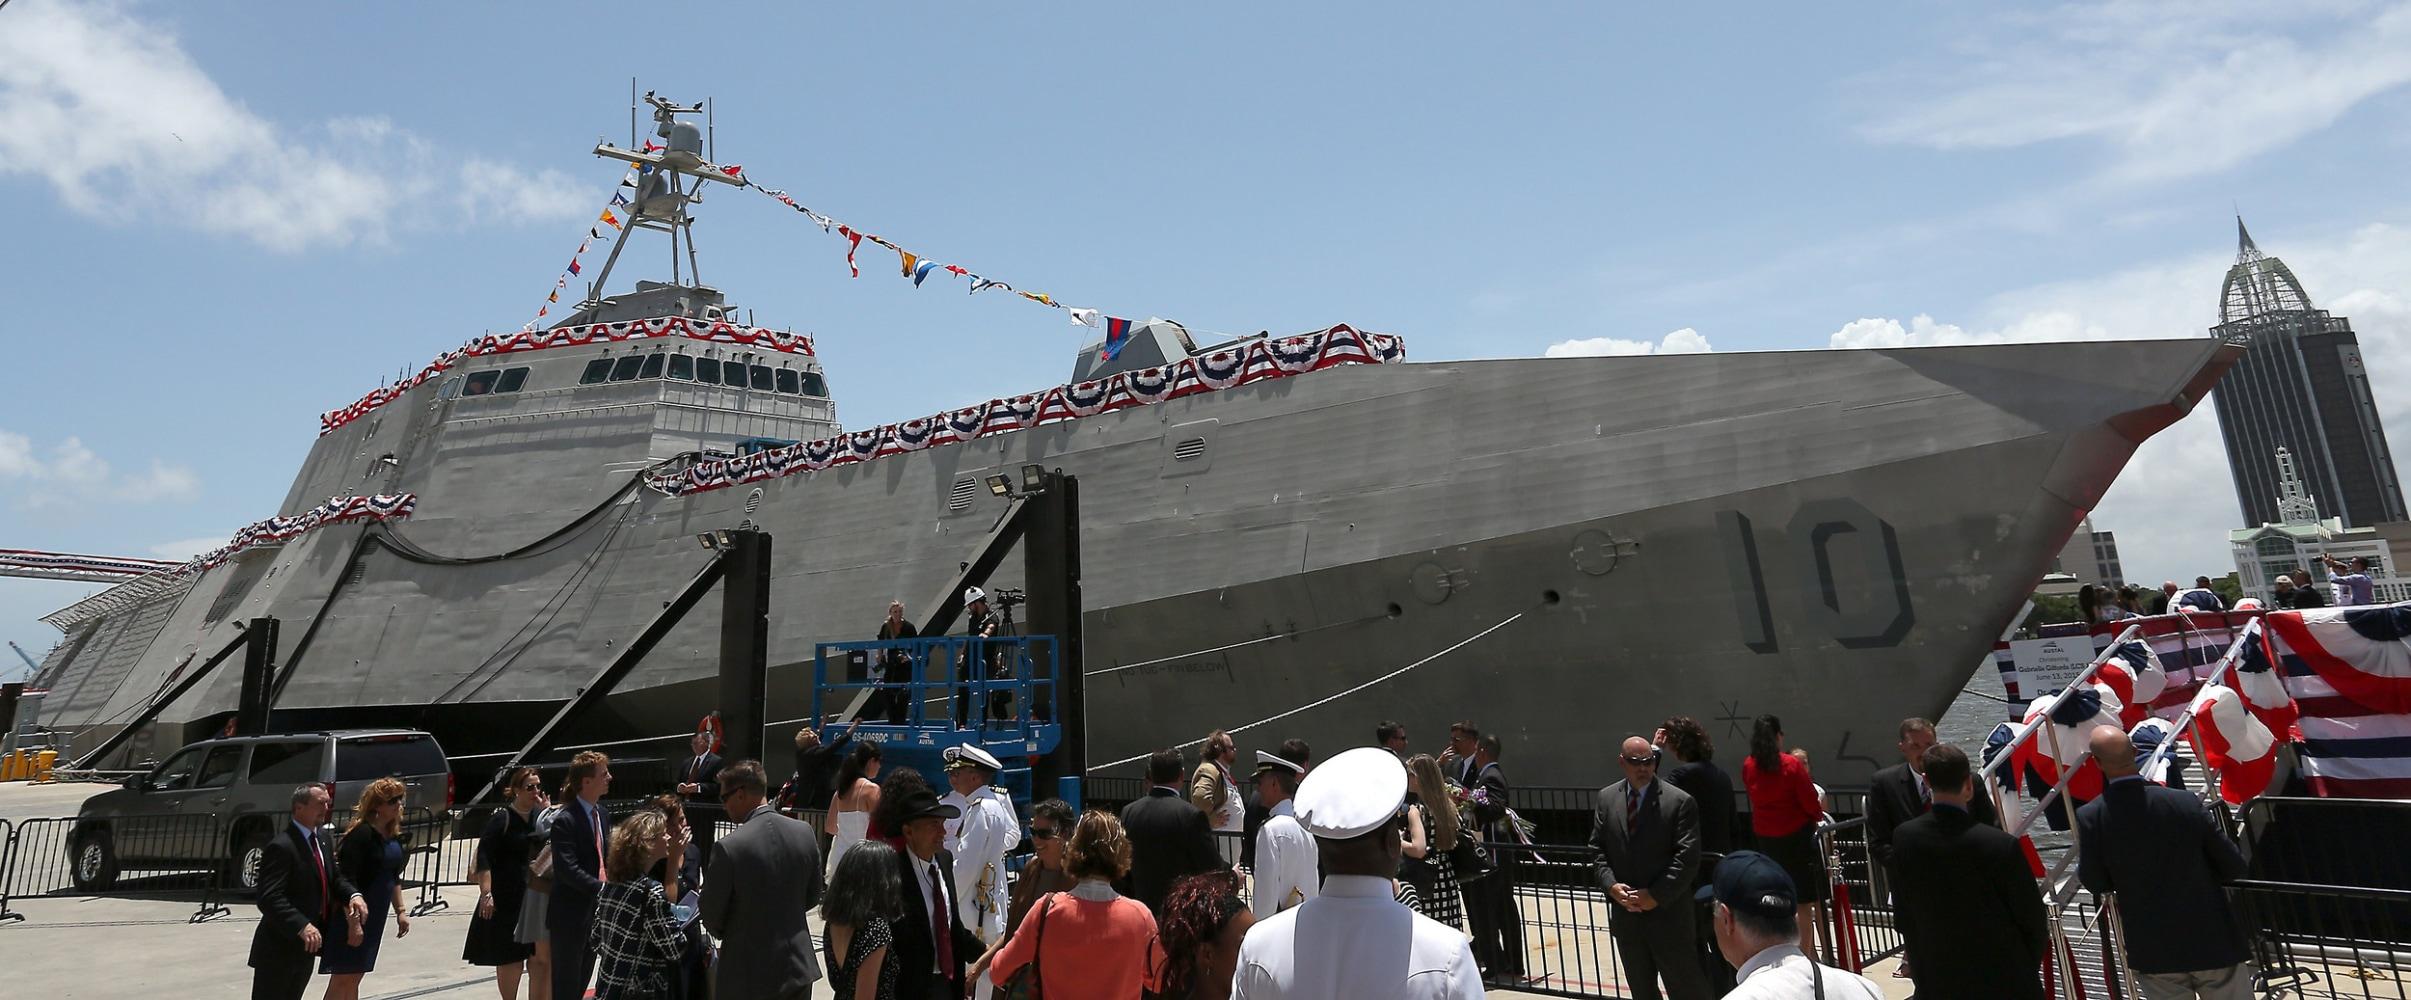 Gabrielle Giffords Courage Navy Ship Christened For Former Congresswoman Gabrielle